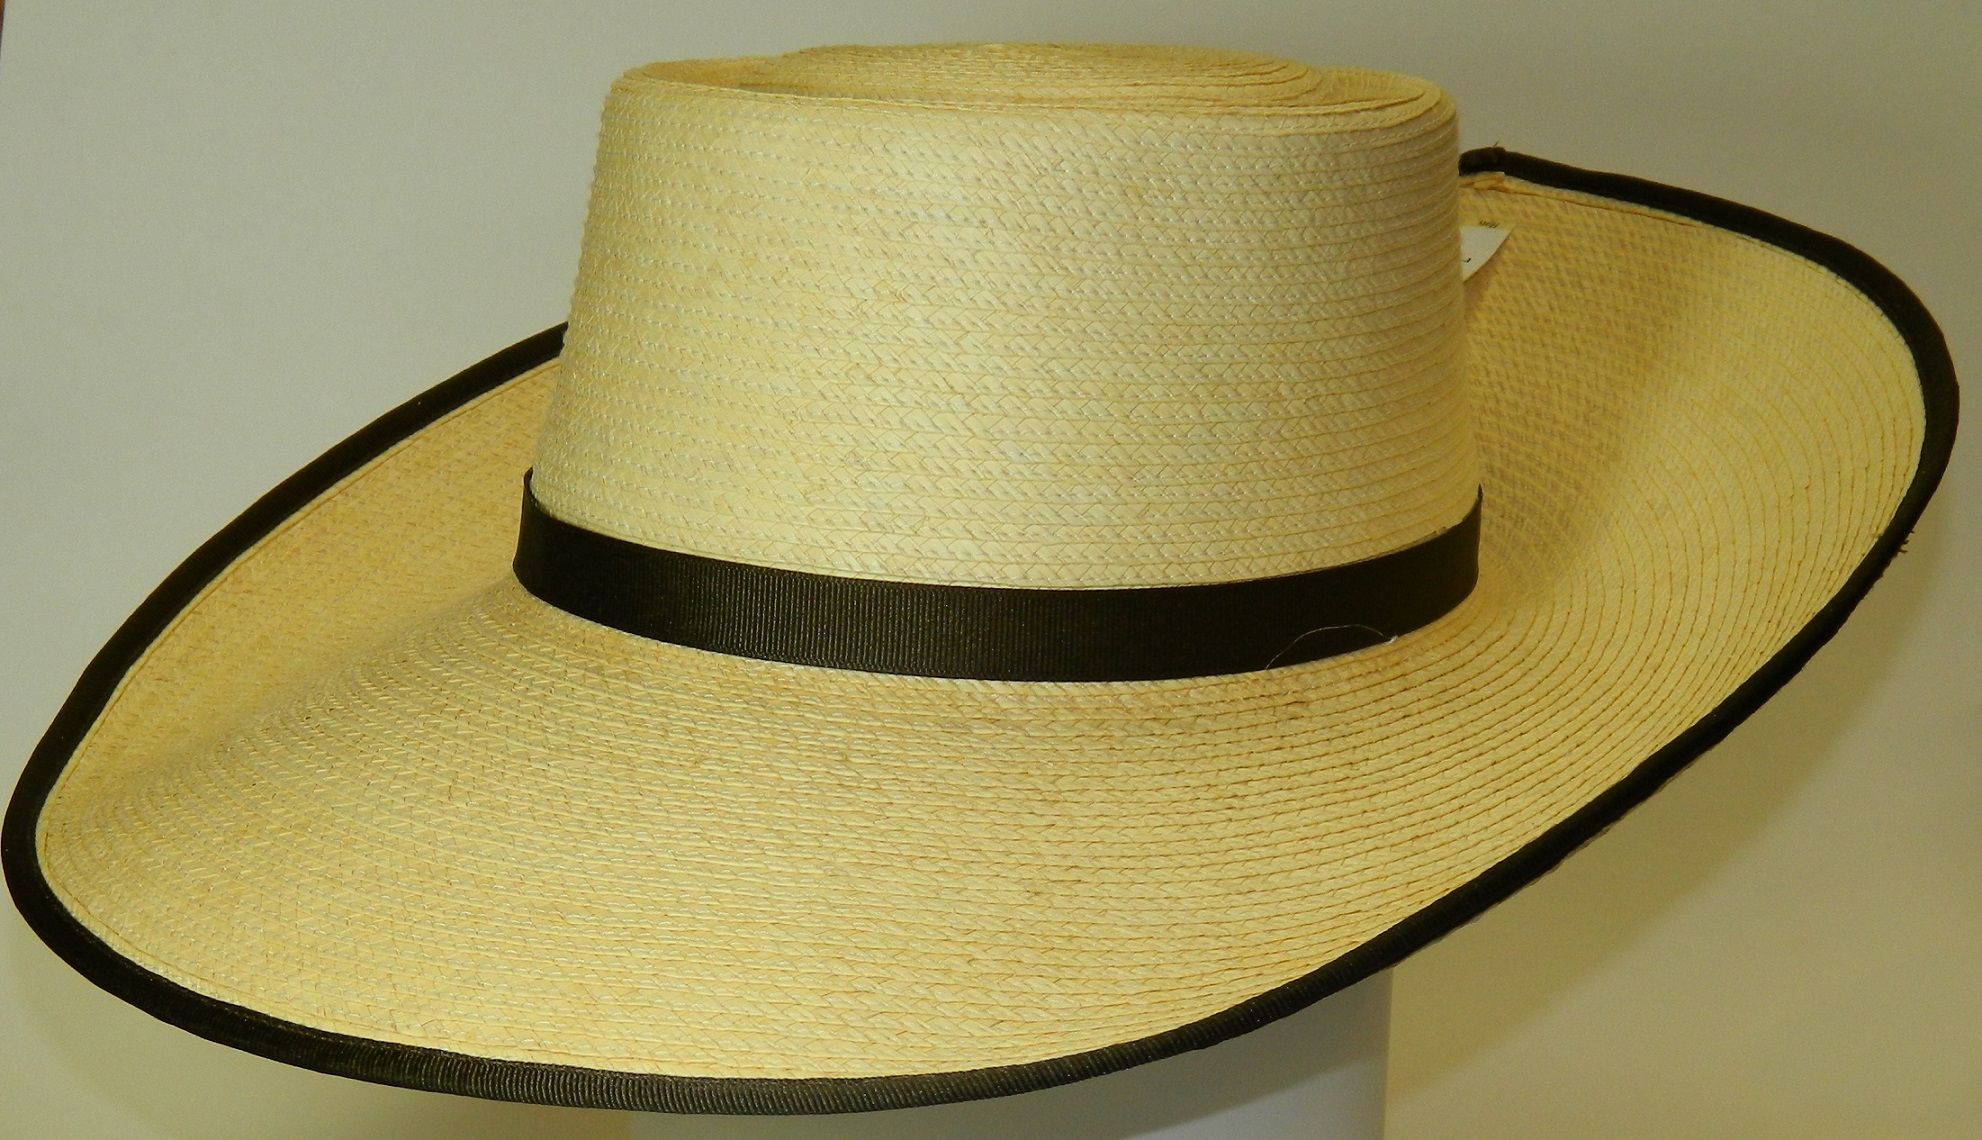 Montana Rio Buckaroo Hats Style - Year of Clean Water